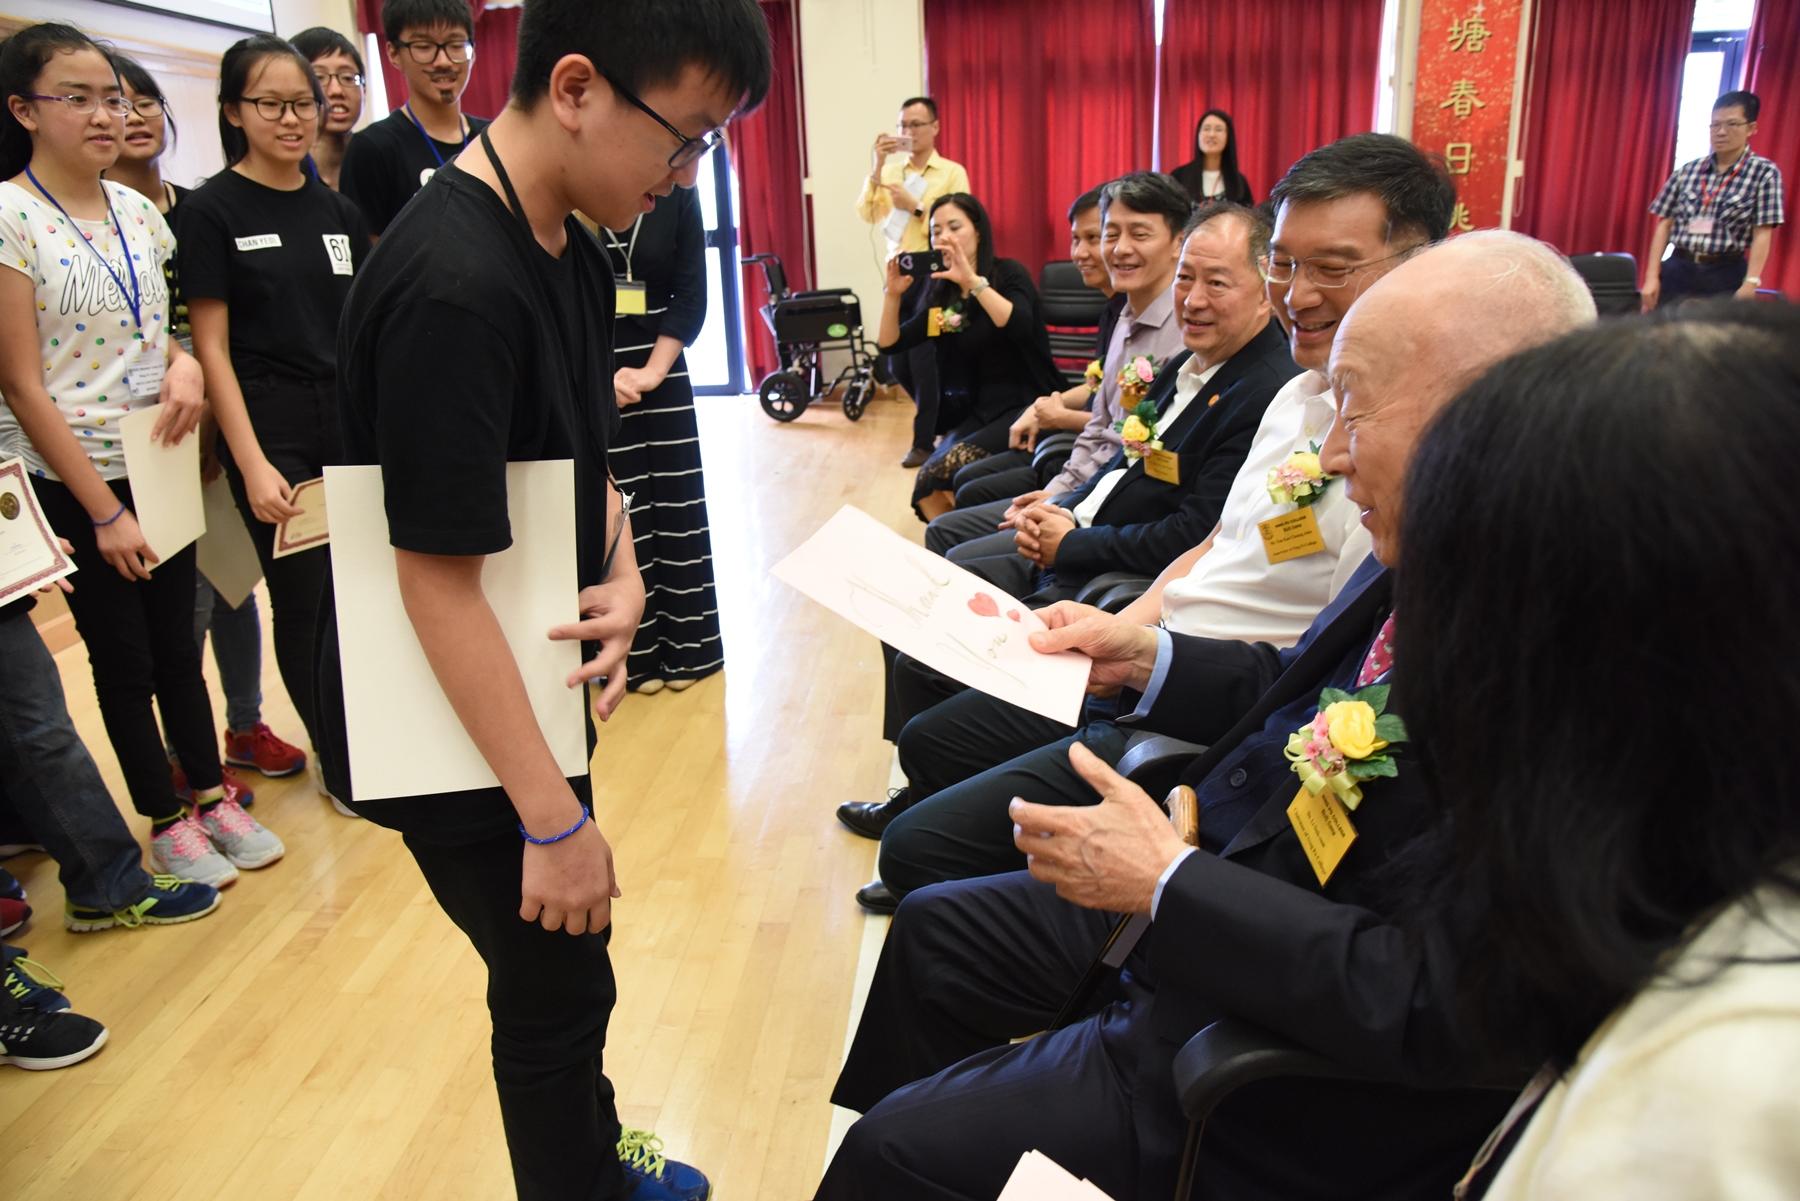 http://www.npc.edu.hk/sites/default/files/dsc_0276_1.jpg